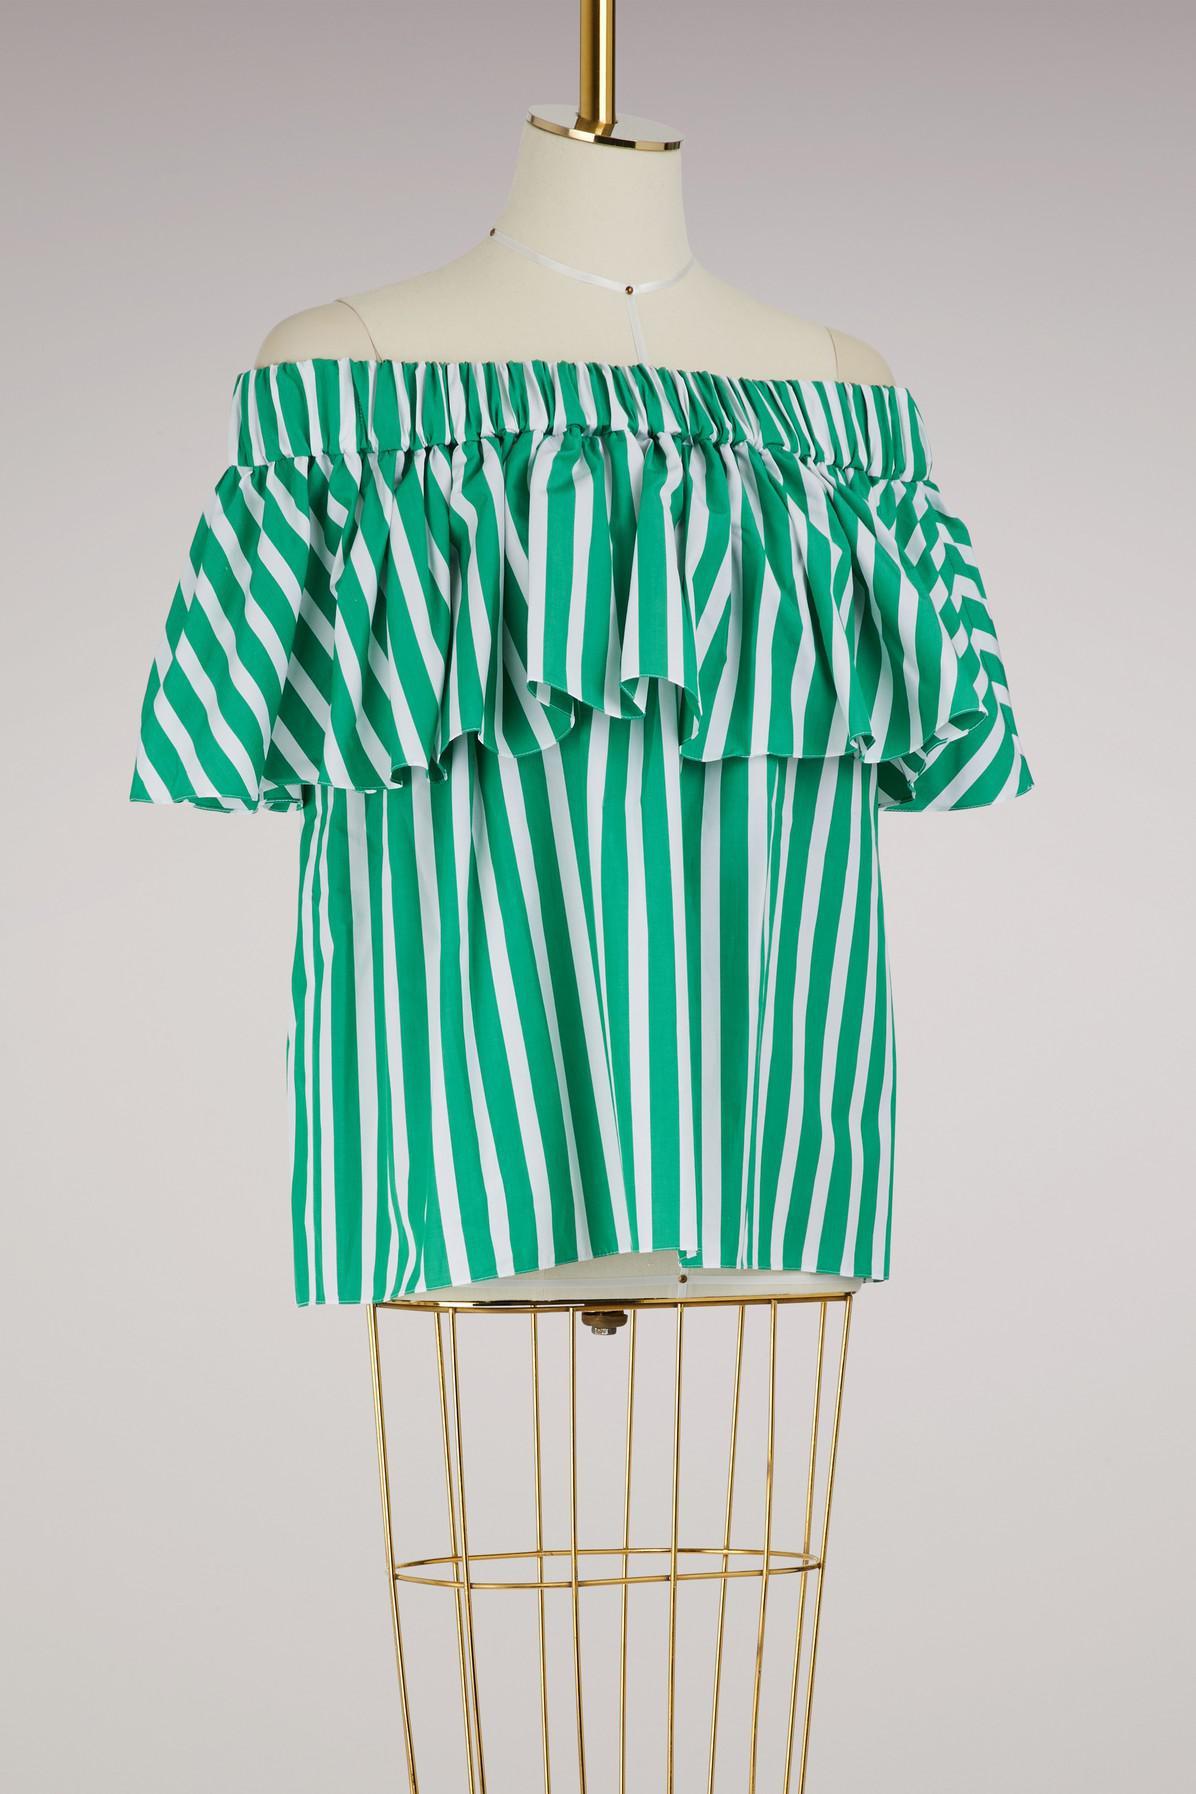 70b2fa241aeb5 Maison Rabih Kayrouz - Green Strapless Stripped Top - Lyst. View fullscreen